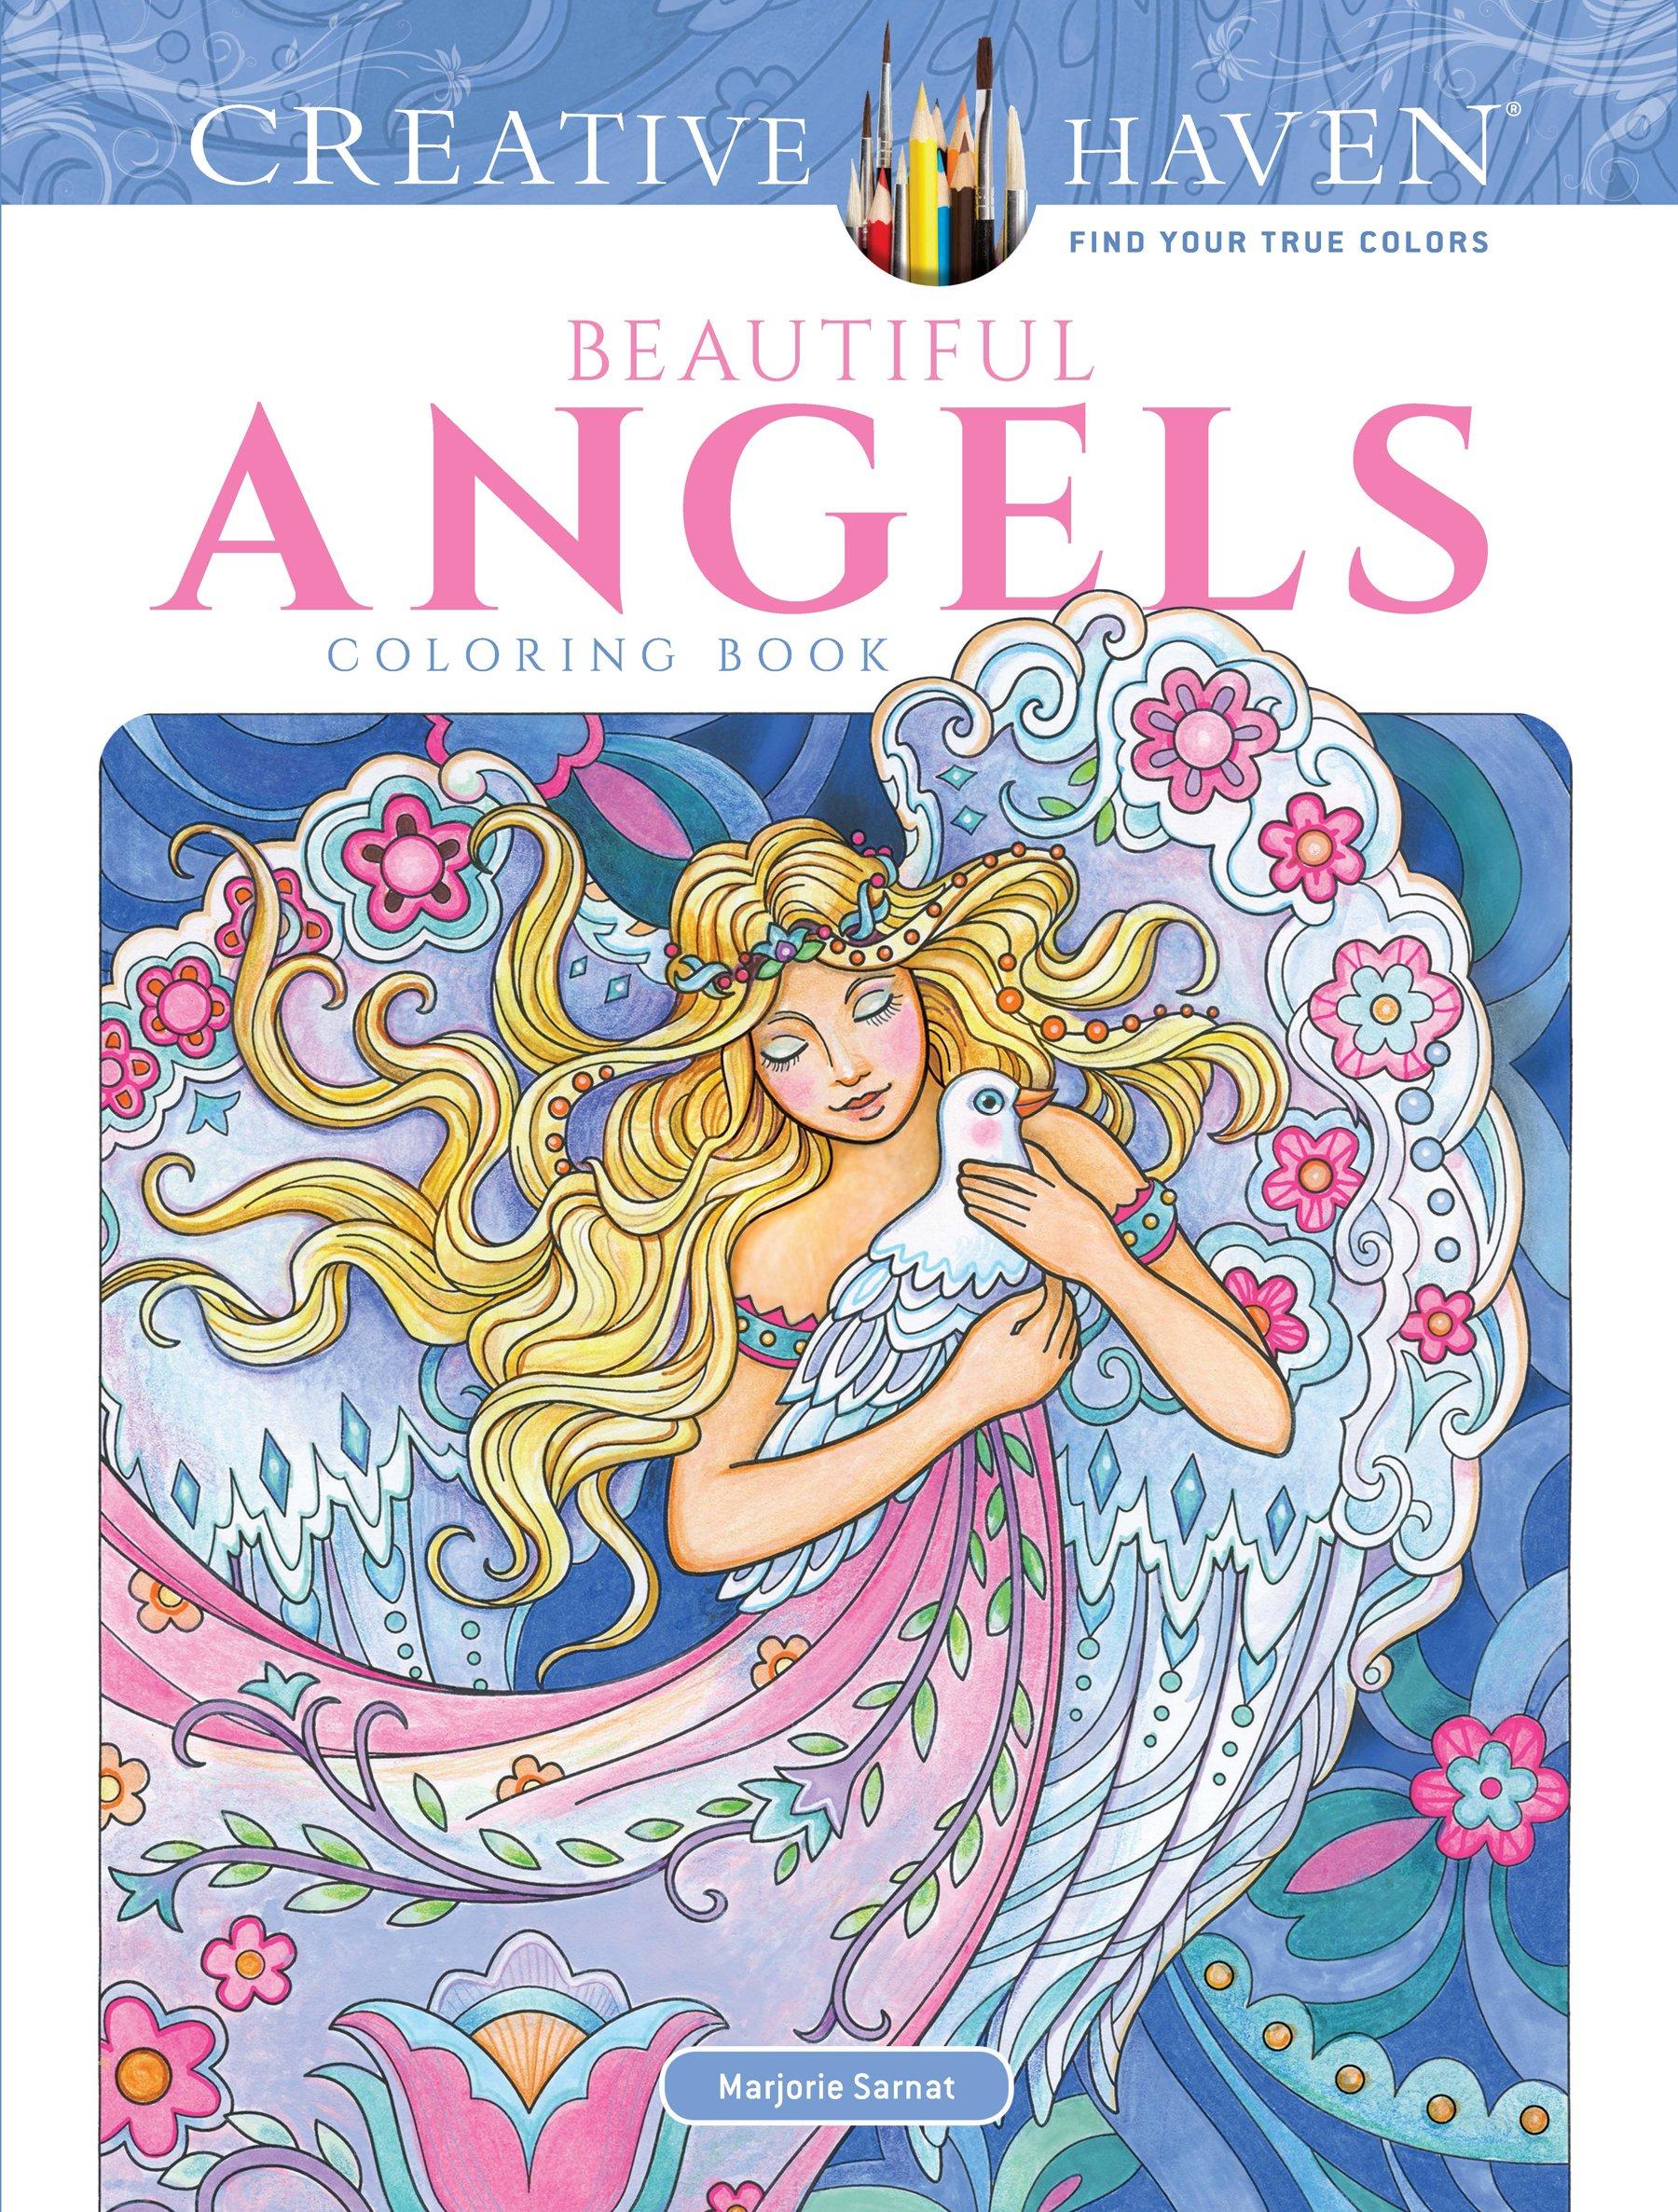 Amazon.com: Creative Haven Beautiful Angels Coloring Book (Adult ...